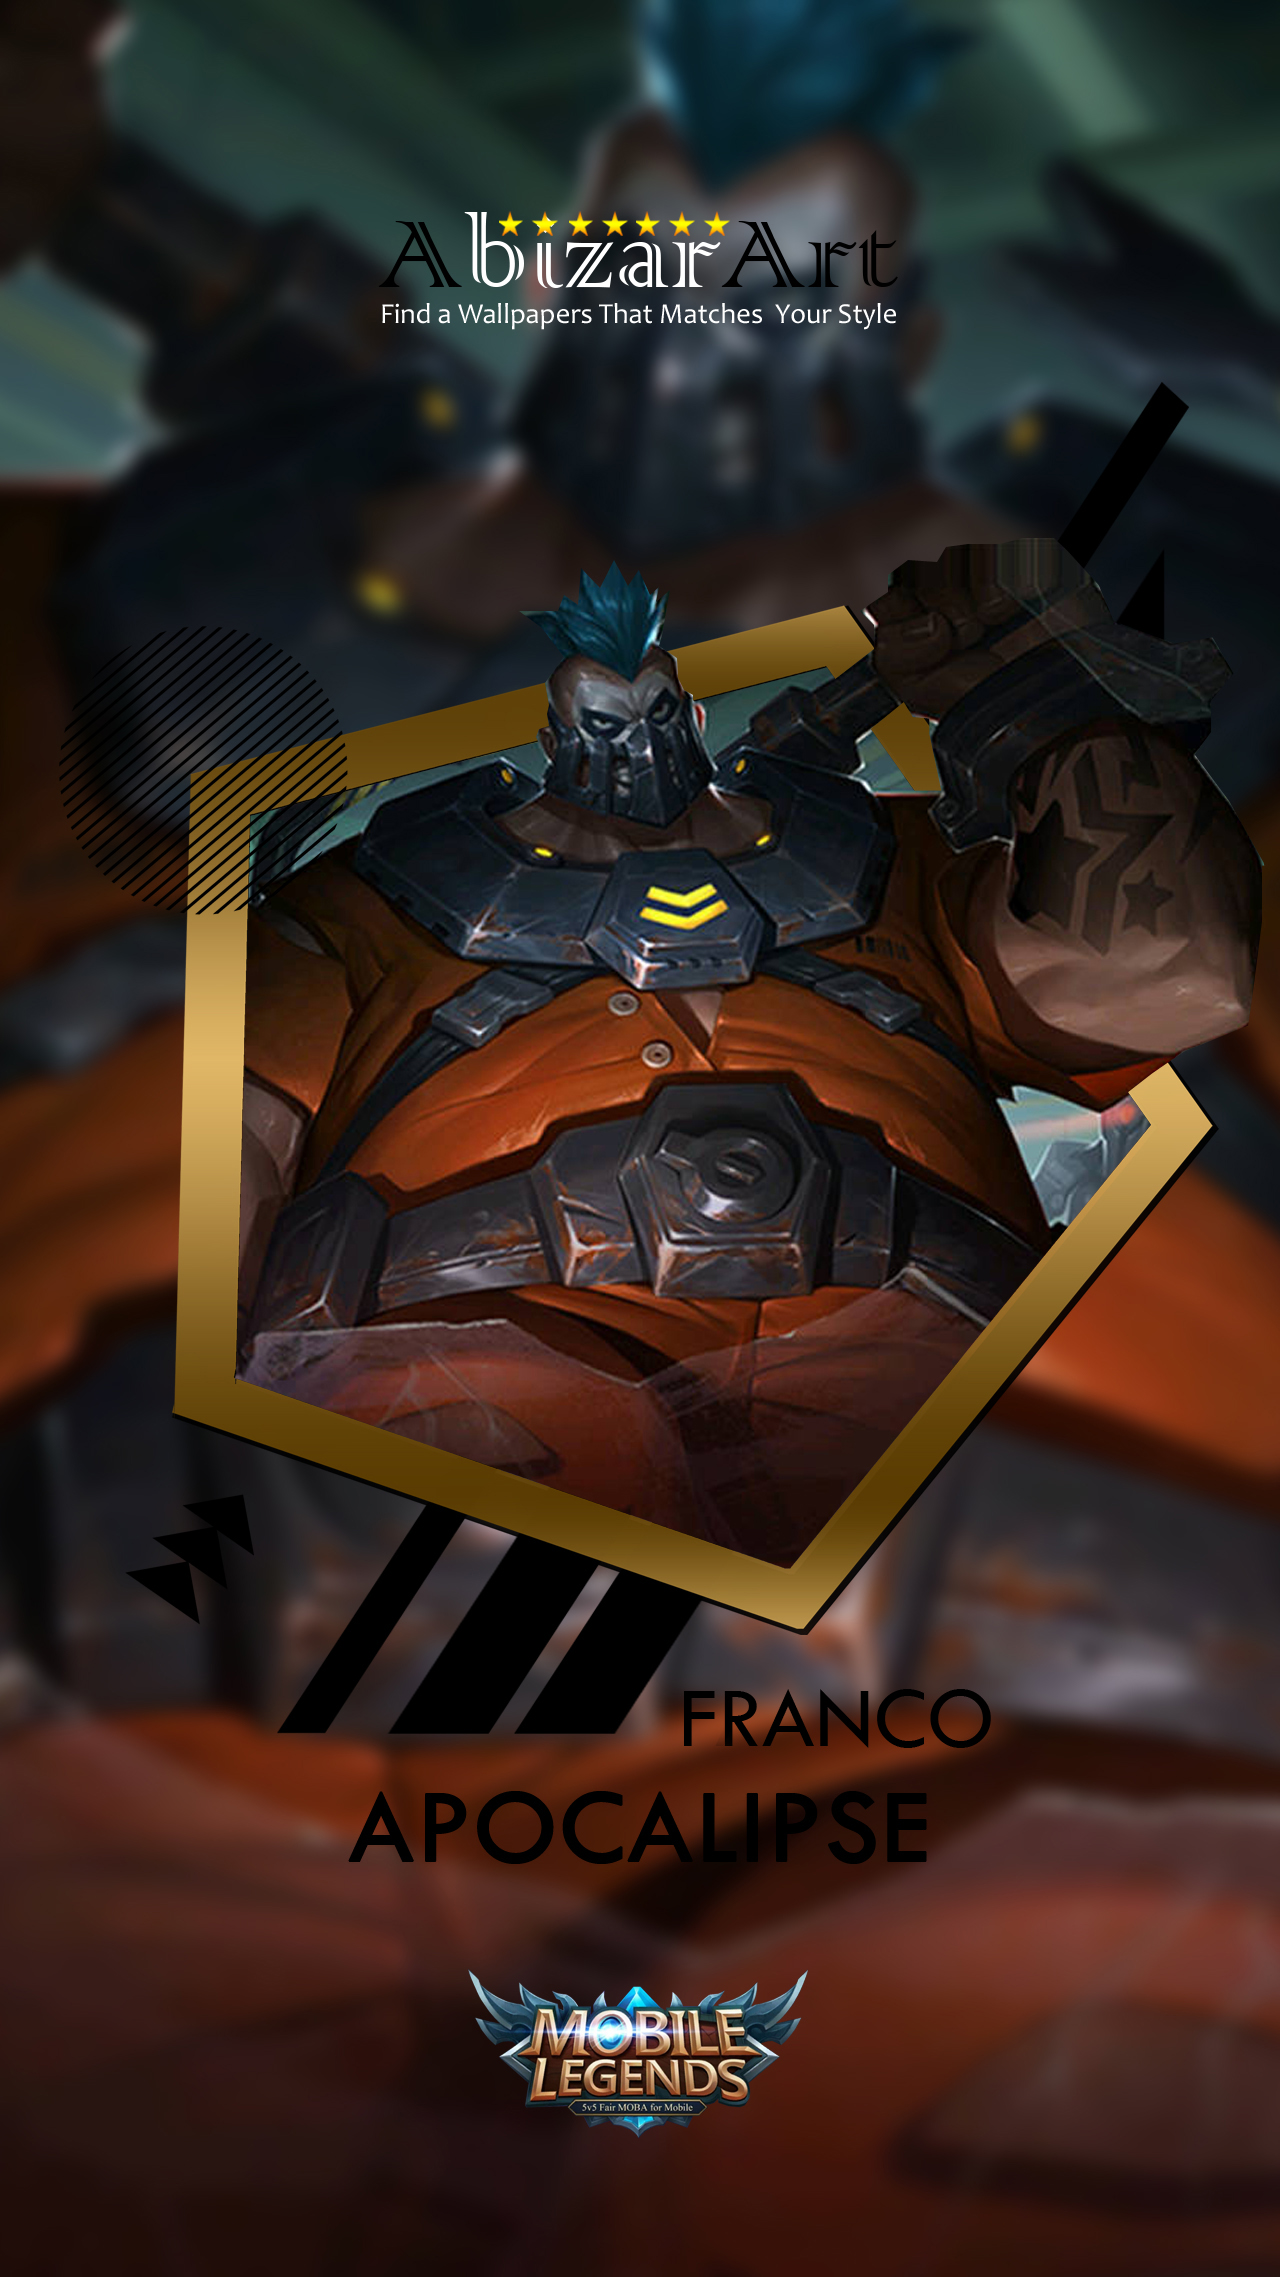 Franco Apocalypse By AbizarArtWallpapers On DeviantArt